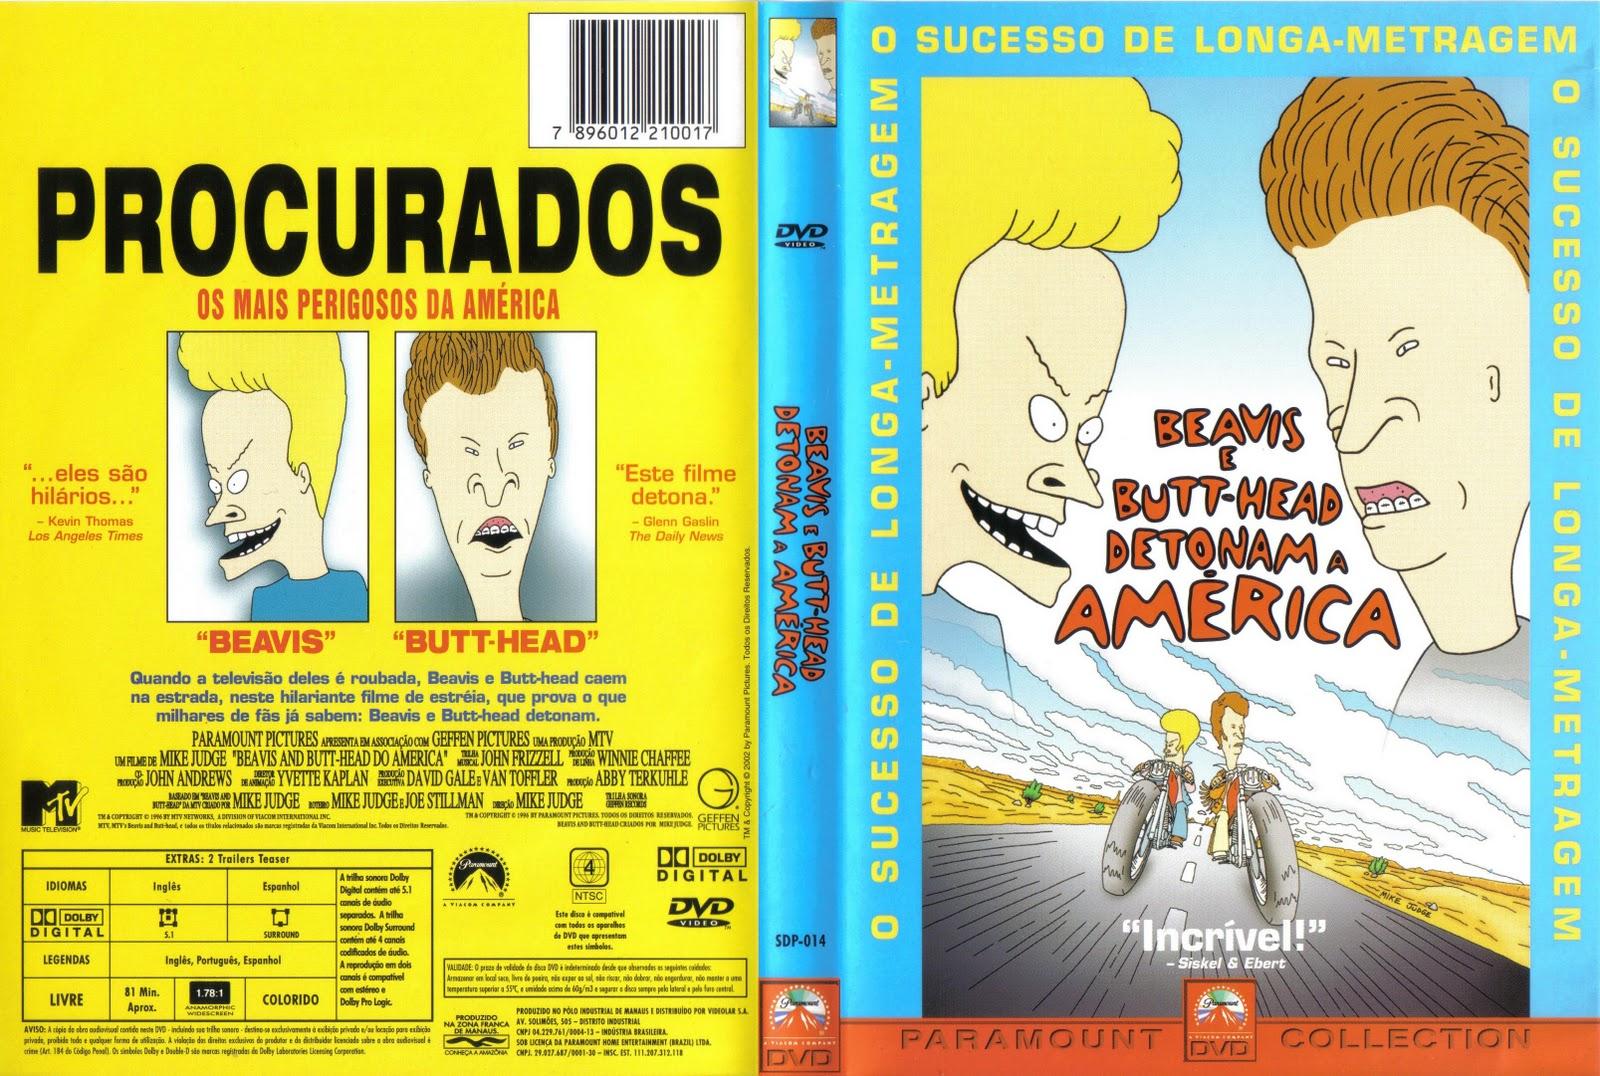 Beavis And Butt-Head Do America 1996 Beavis_e_butt_head_detonam_a_america_dvdbr_admin